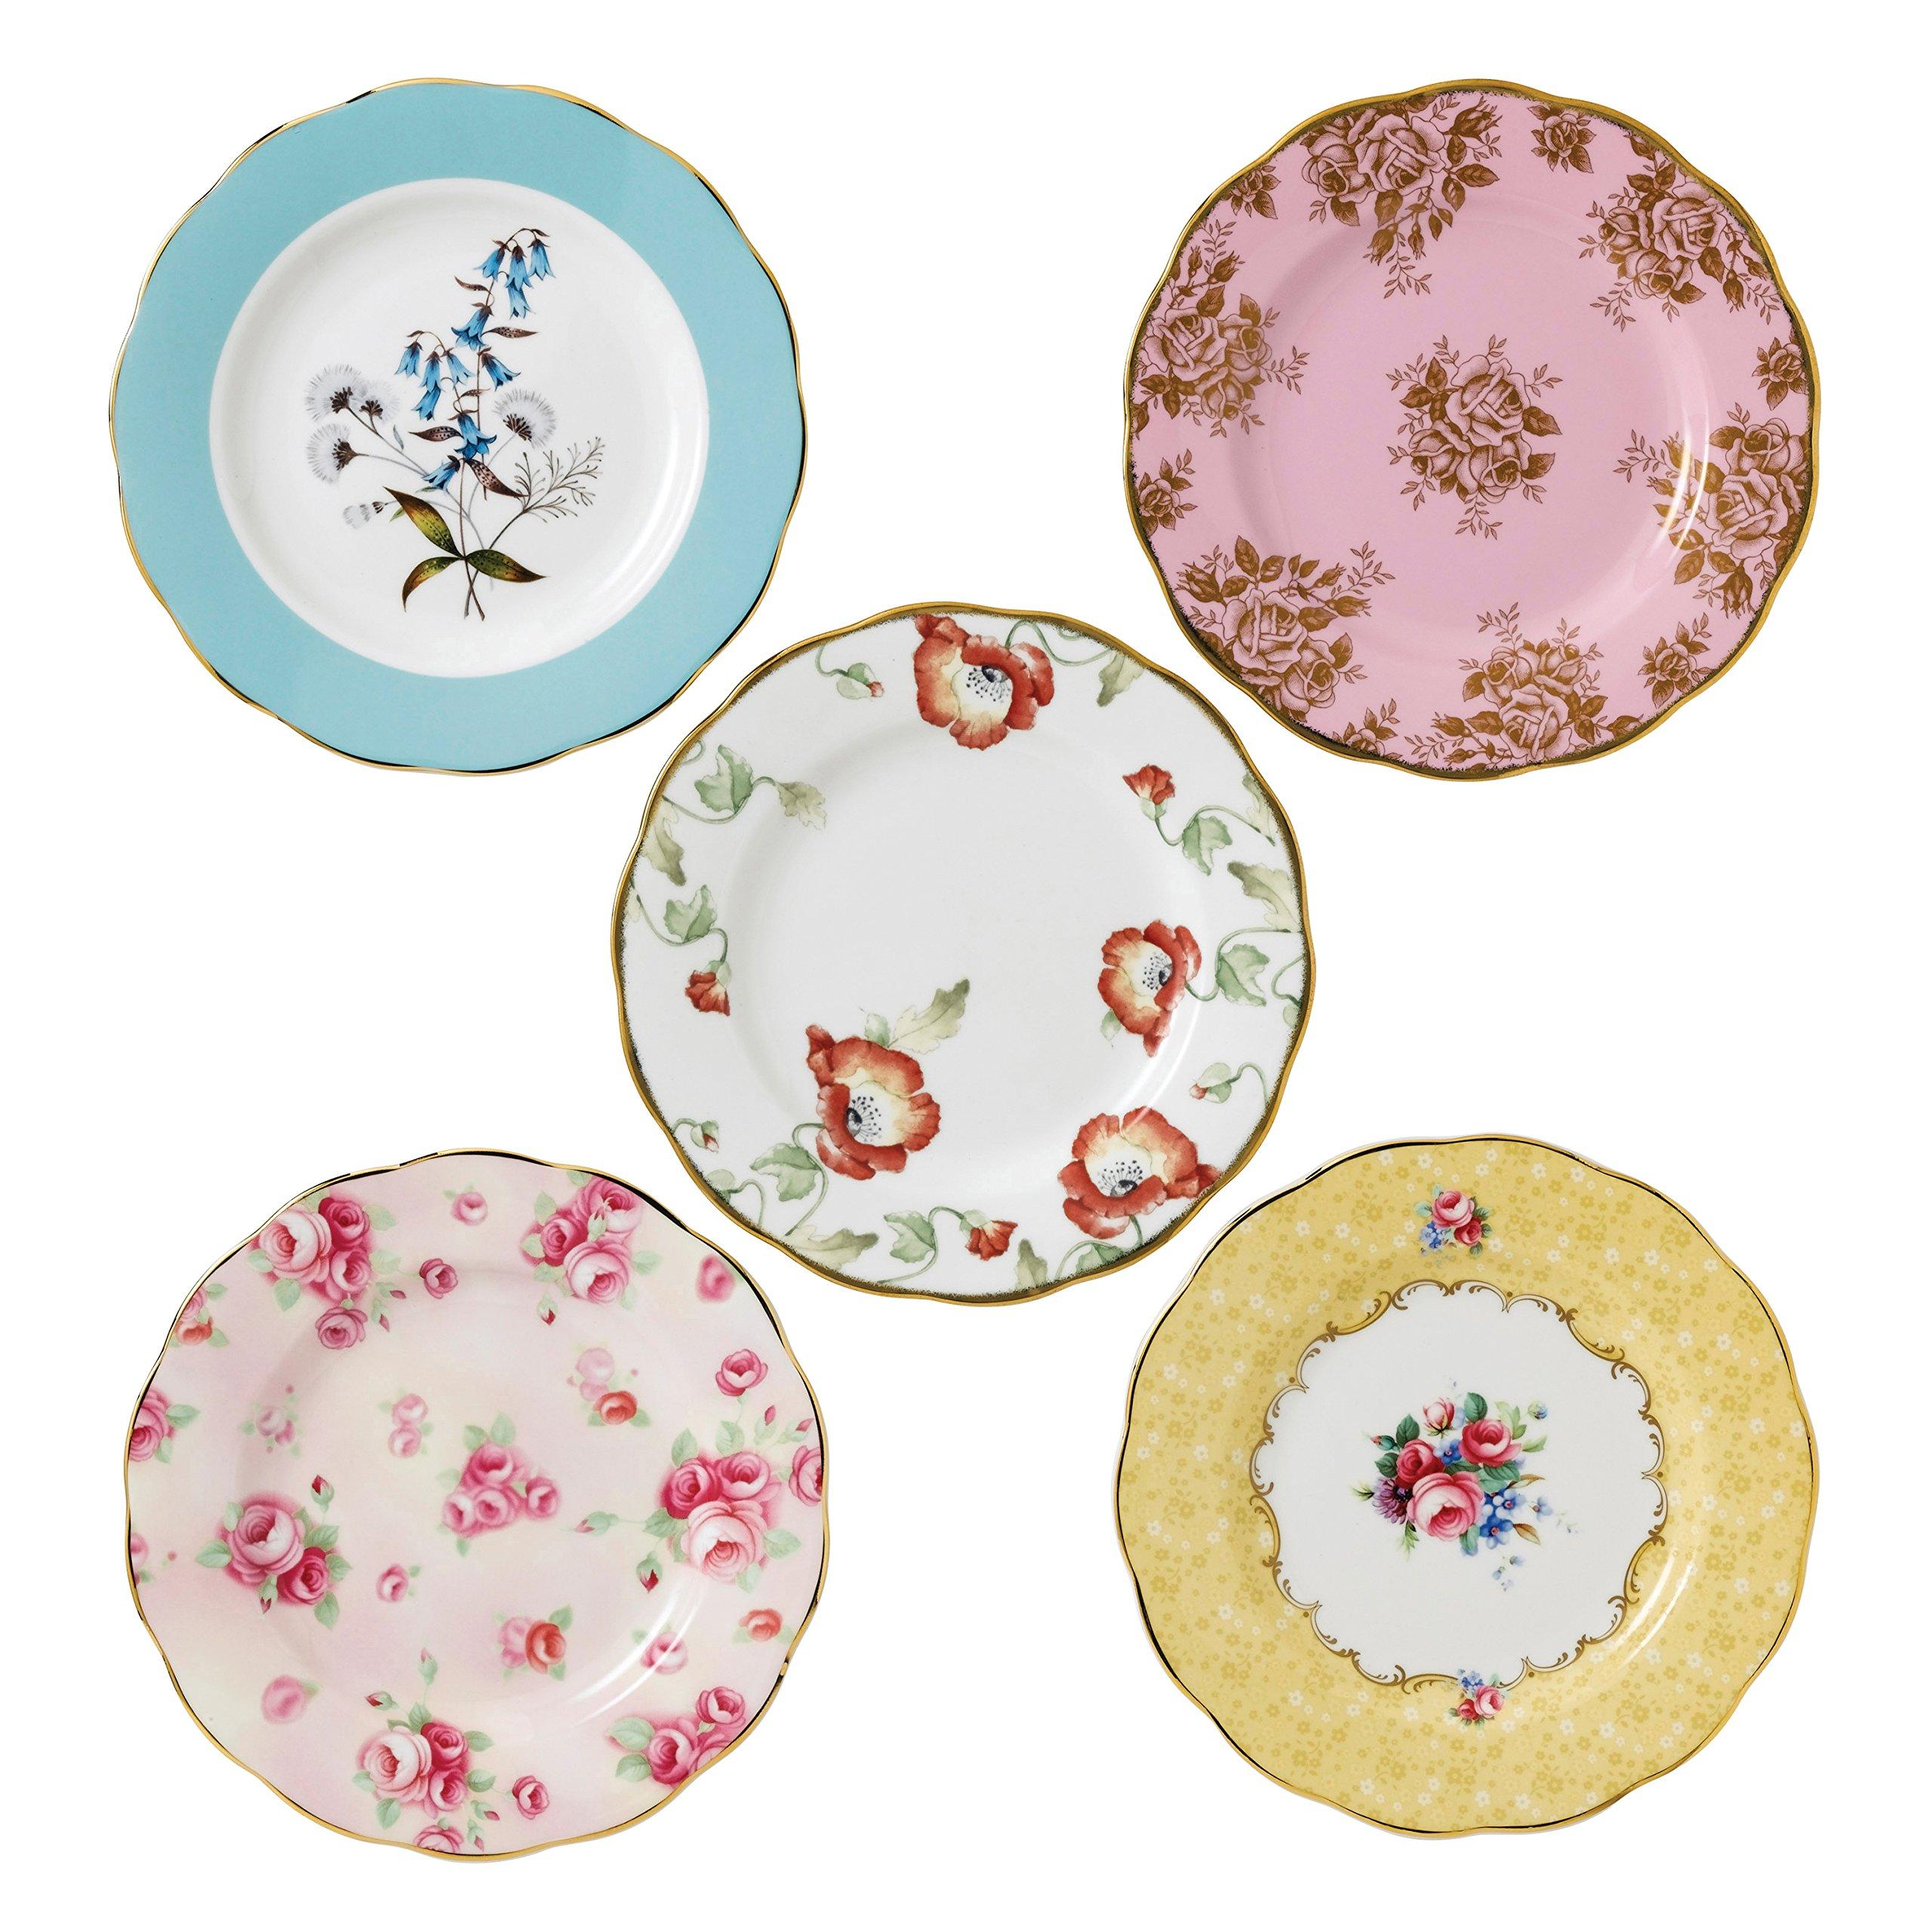 Royal Albert 40017562 100 Years 1950-1990 Plate Set, 8'', Multicolor,5 Piece